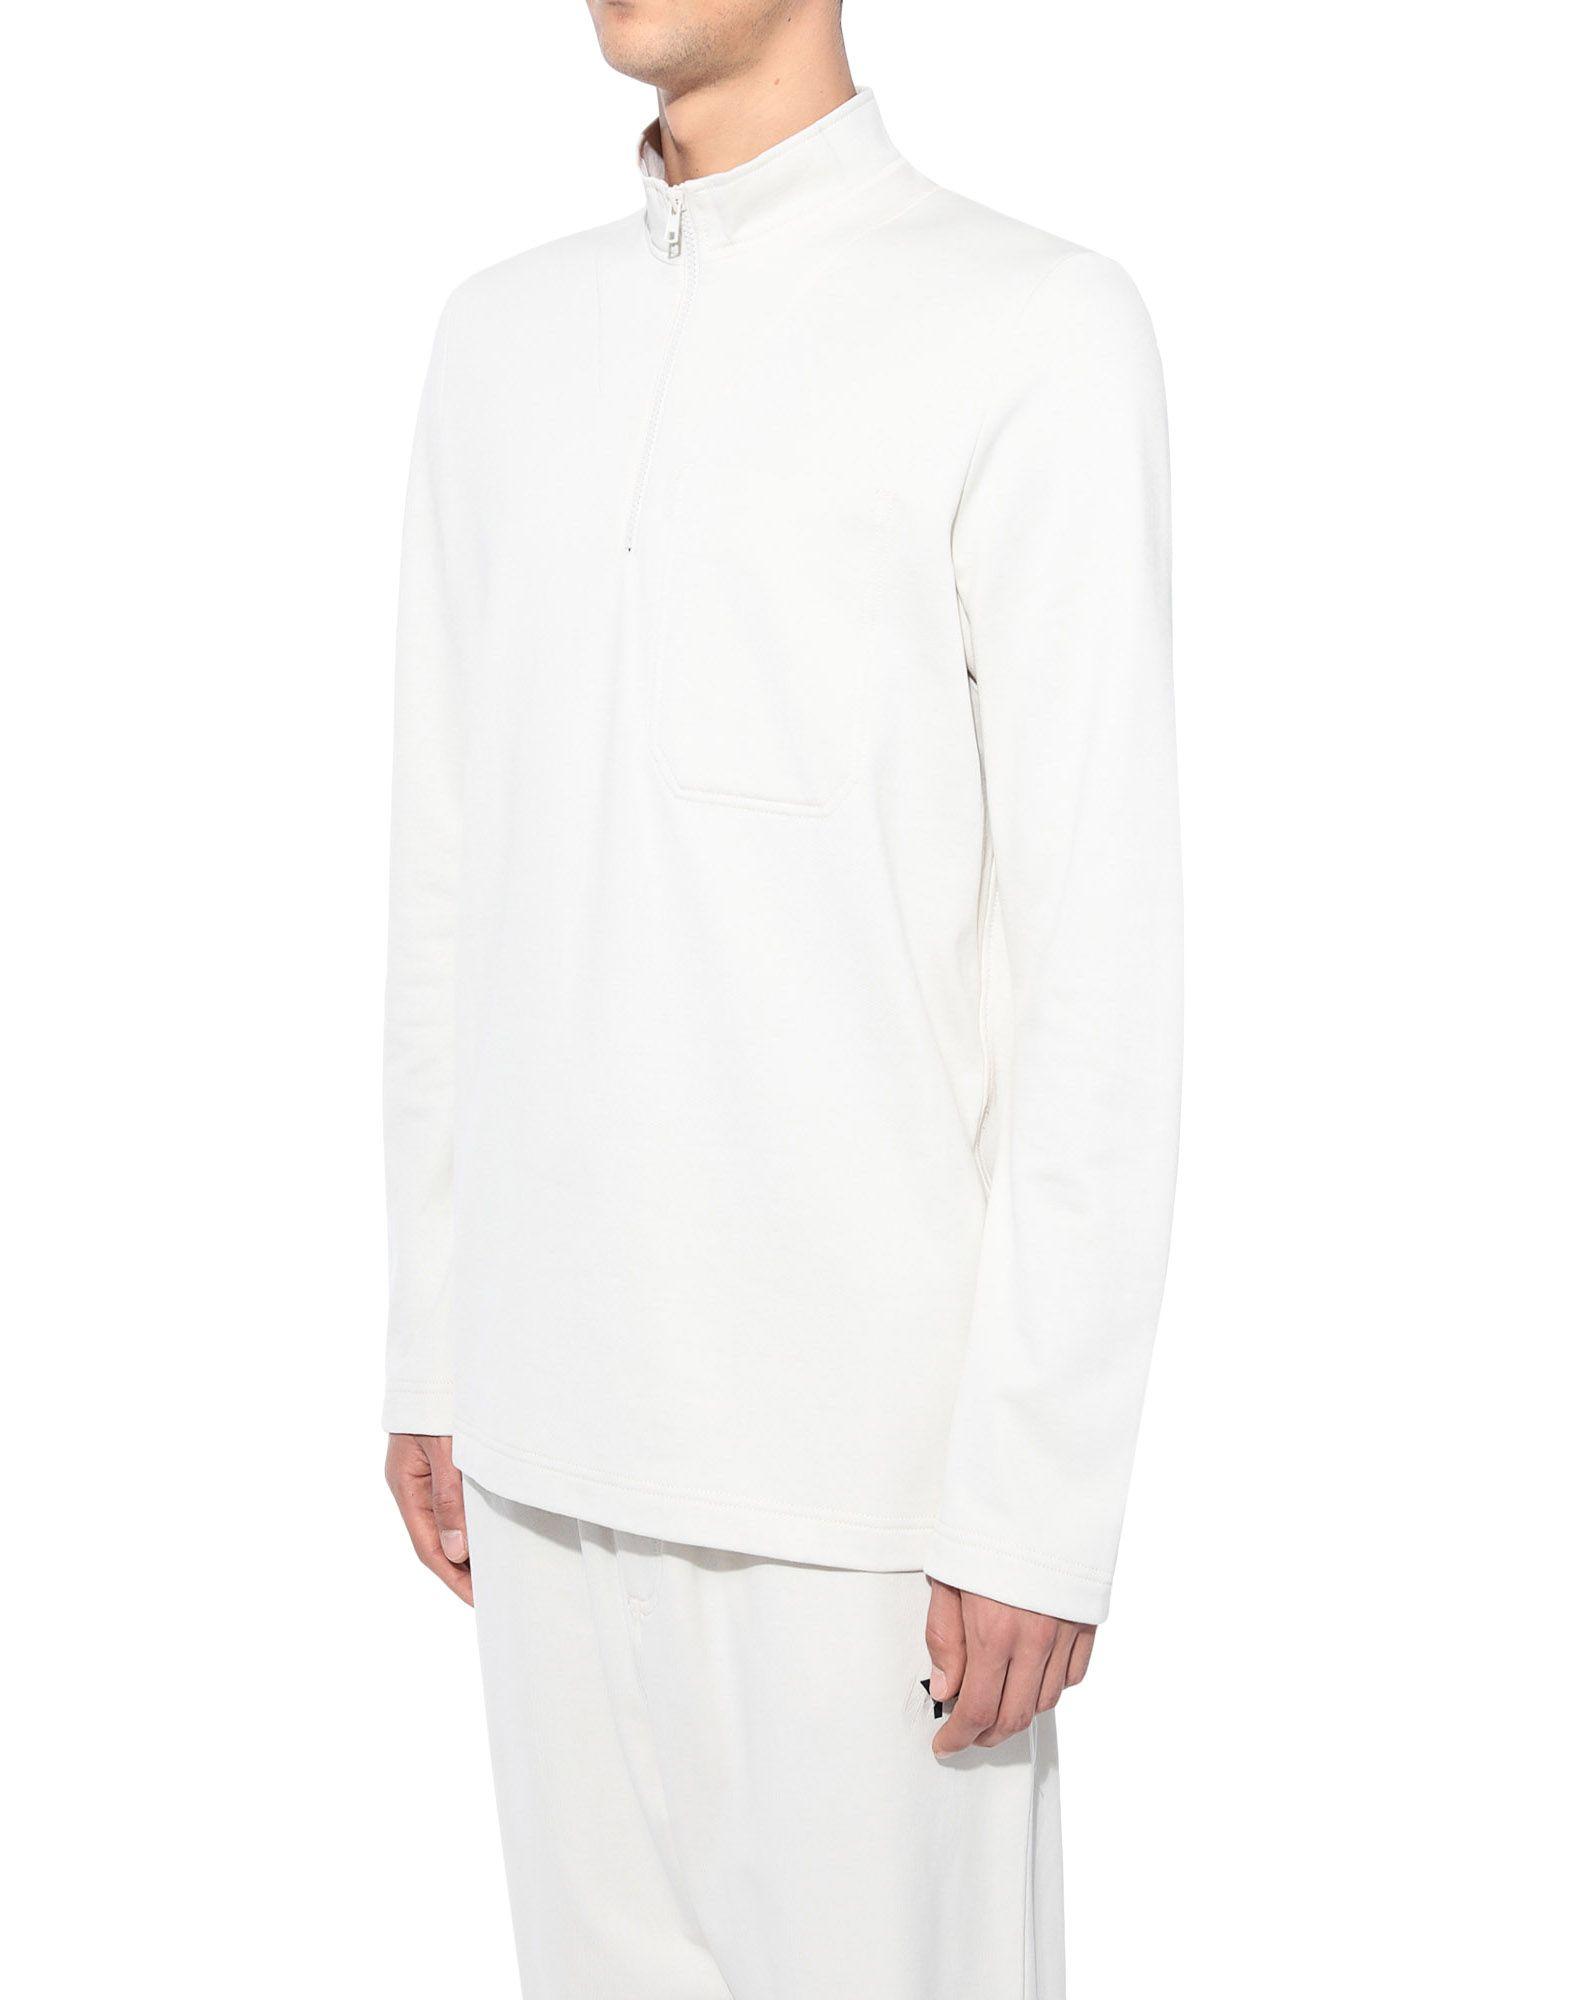 Y-3 Y-3 Sashiko Sweater Zipped jumper Man e